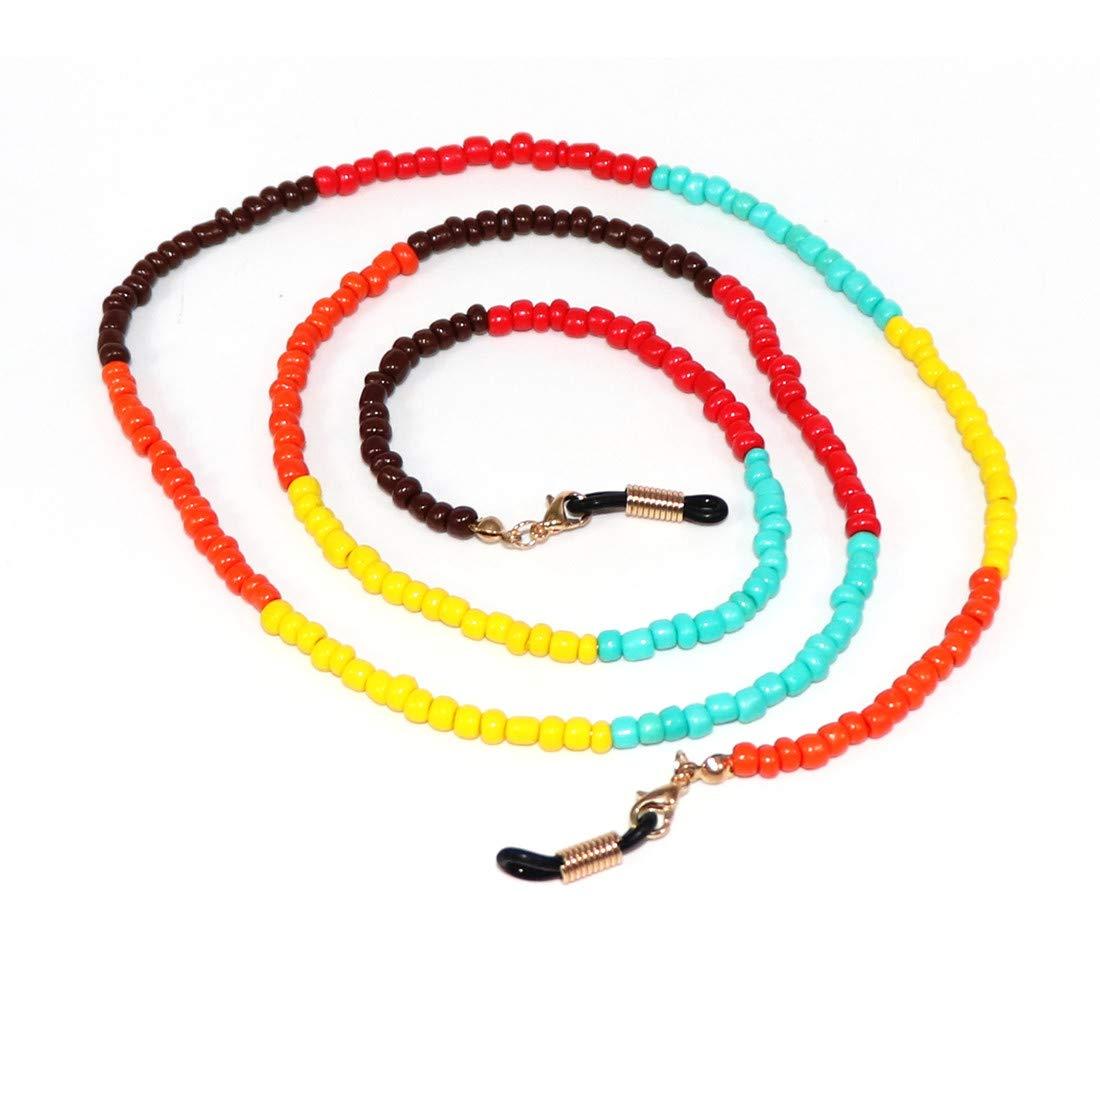 Cute Colorful Beaded Eyeglass Chains Sunglass Holder Strap Eyewear Retainer Lanyard